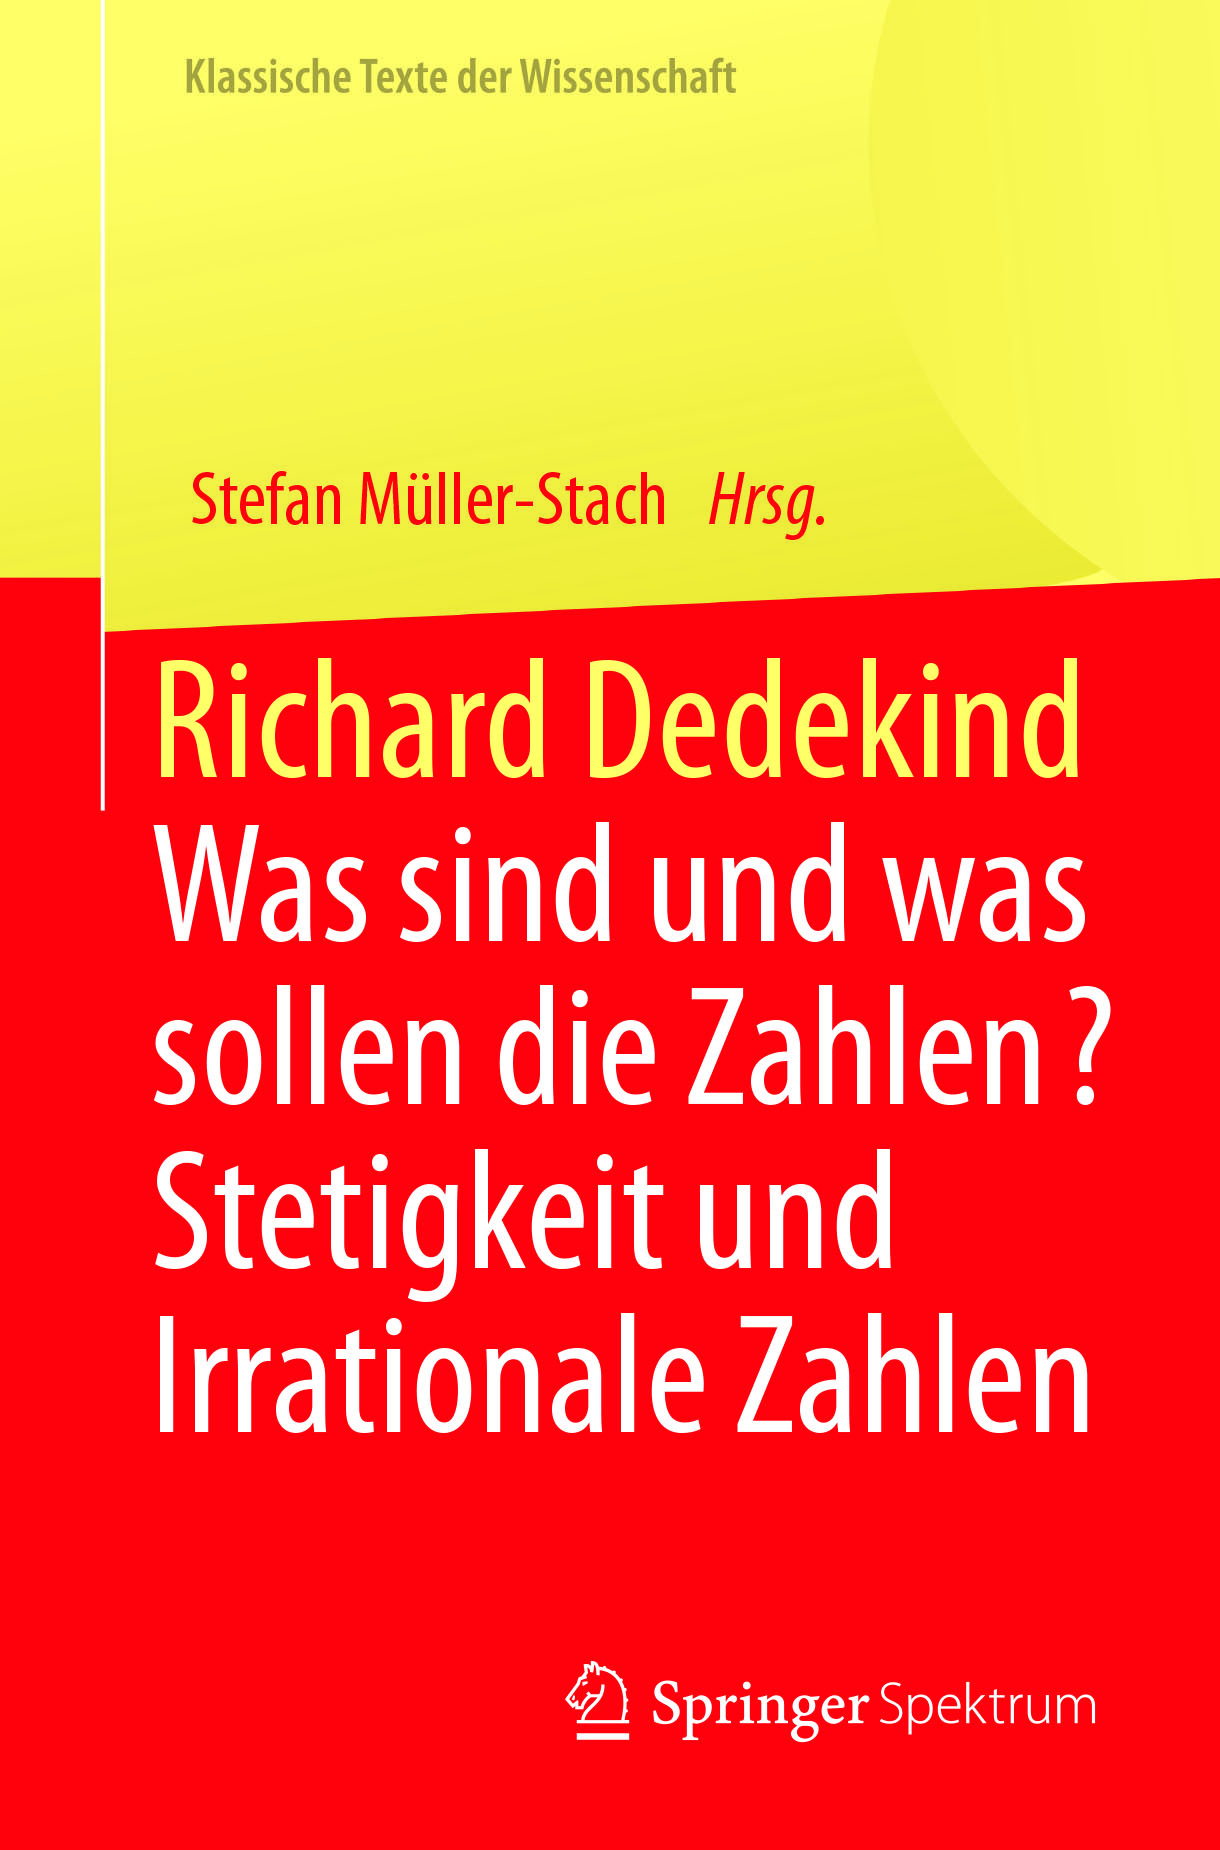 Müller-Stach, Stefan - Richard Dedekind, ebook